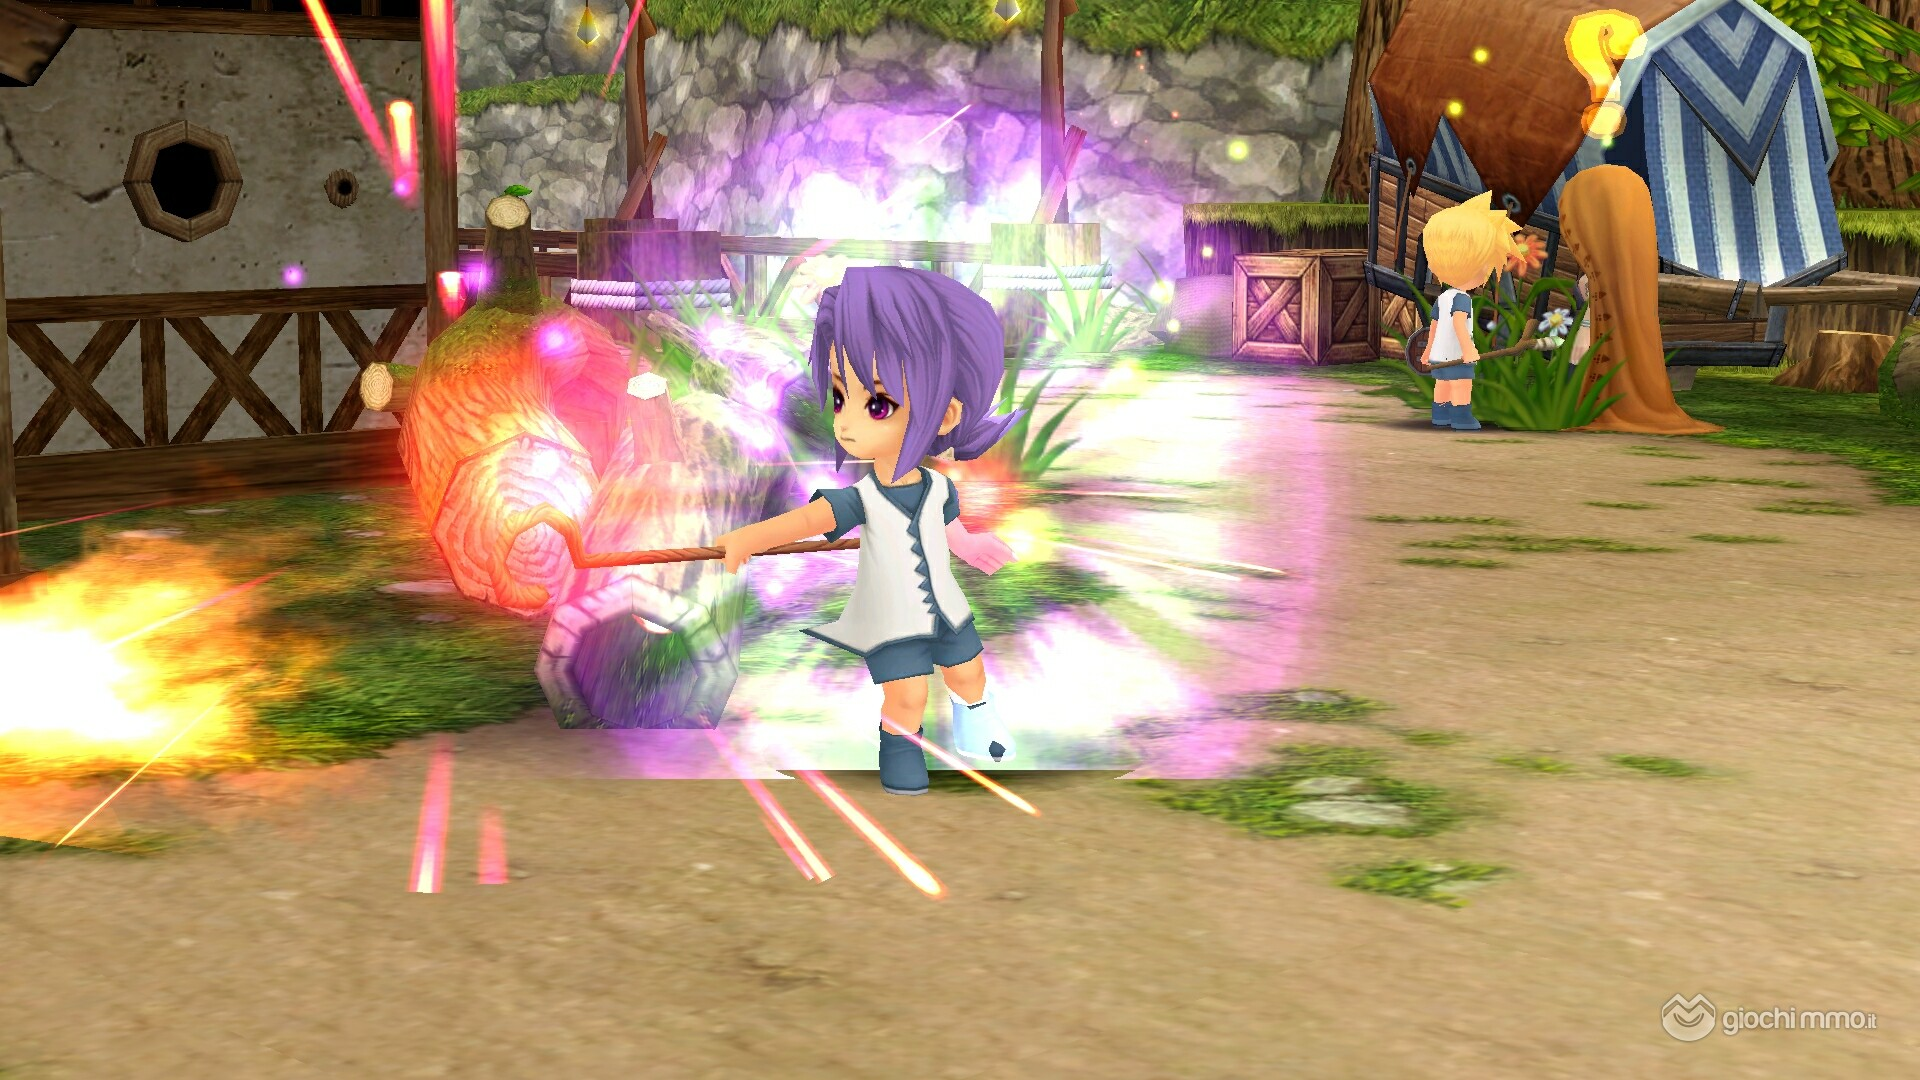 Clicca sull'immagine per ingrandirlaNome:   Legend of edda screen04.jpgVisite: 56Dimensione:   469.0 KBID: 8527